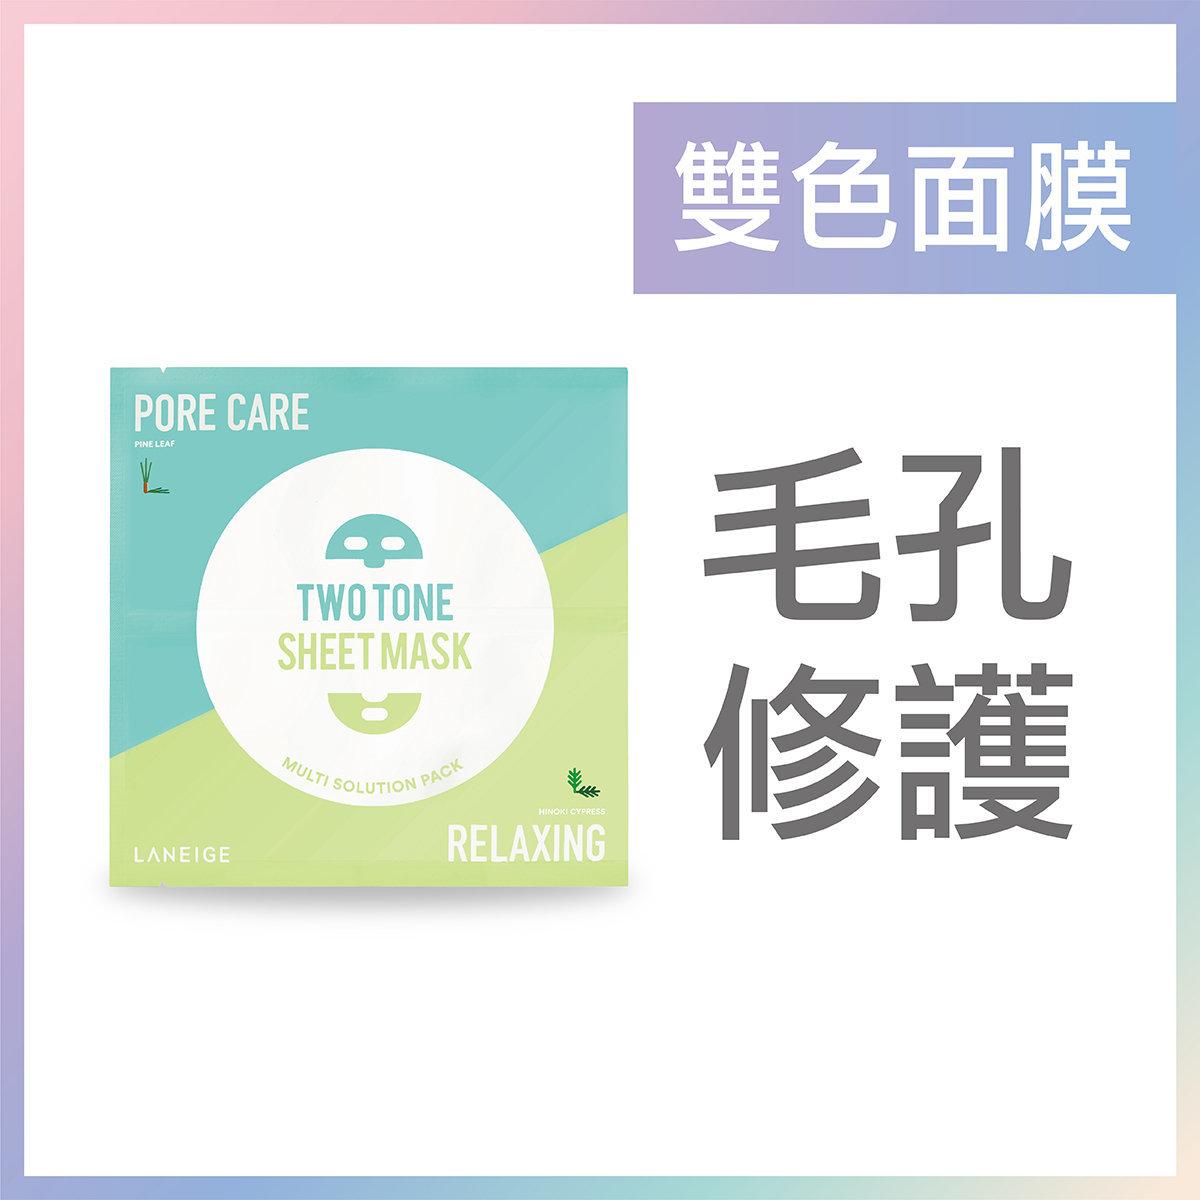 Two Tone Sheet Mask (Pore care & Relaxing)